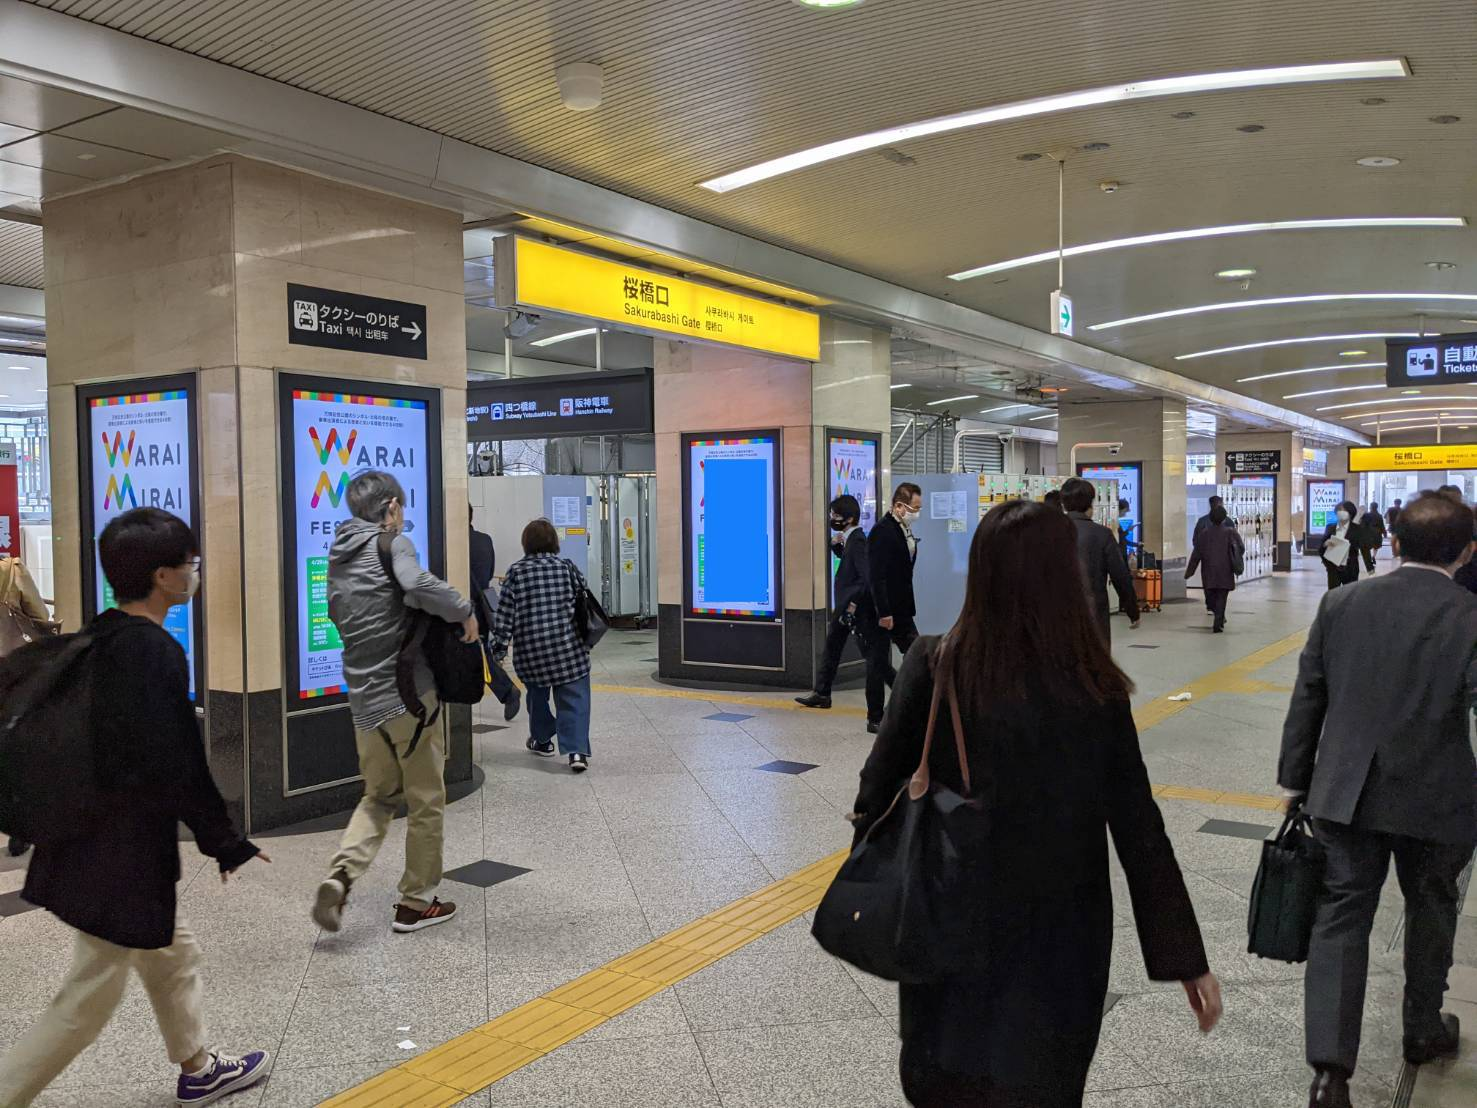 JR大阪駅桜橋口改札外サイネージ ジャック広告